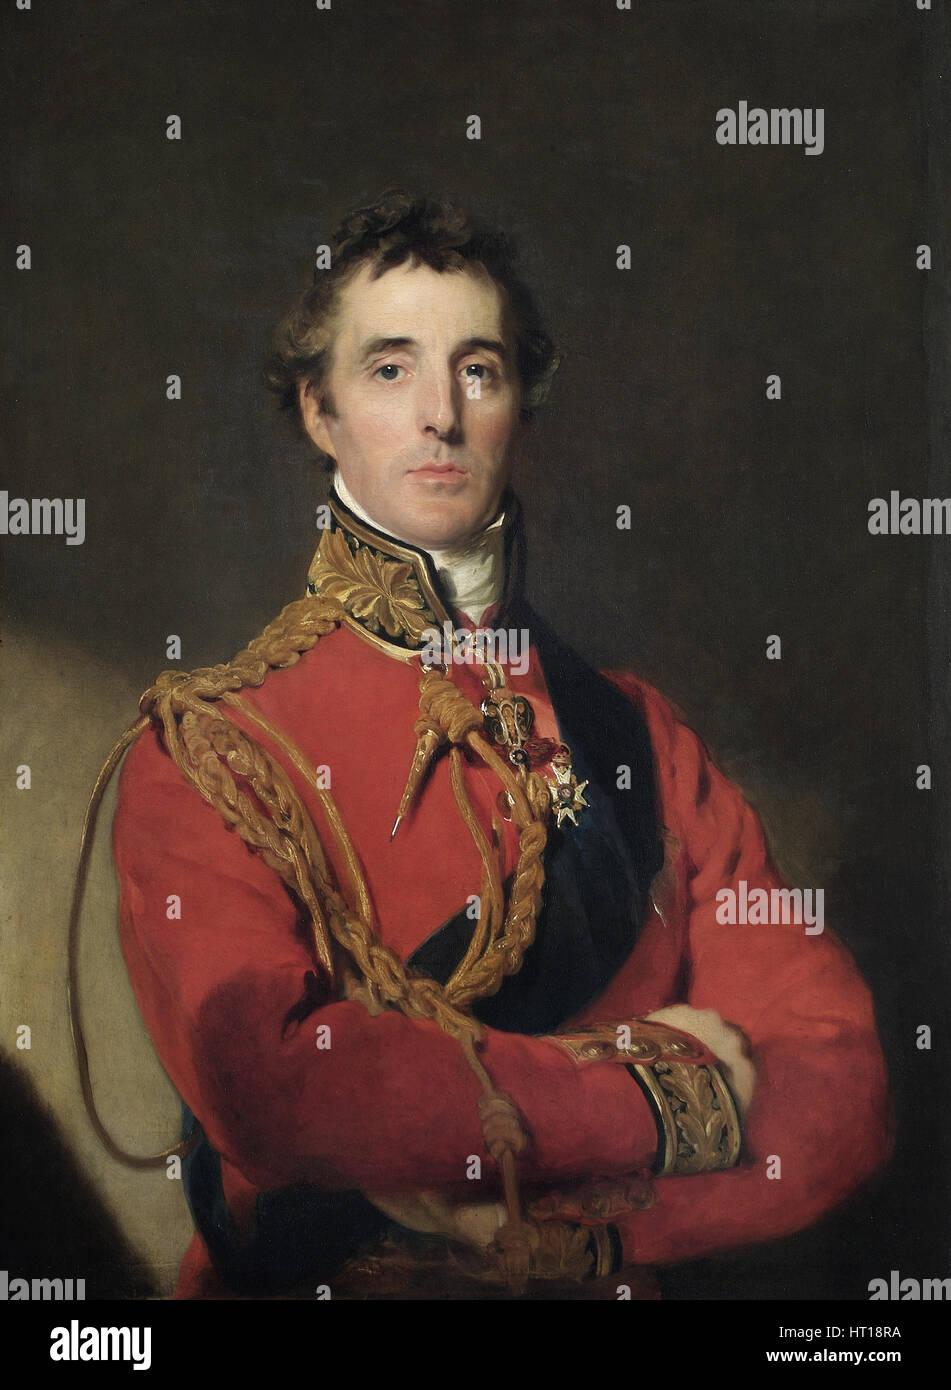 Portrait of Arthur Wellesley (1769-1852), 1st Duke of Wellington, 1815-1816. Artist: Lawrence, Sir Thomas (1769 - Stock Image